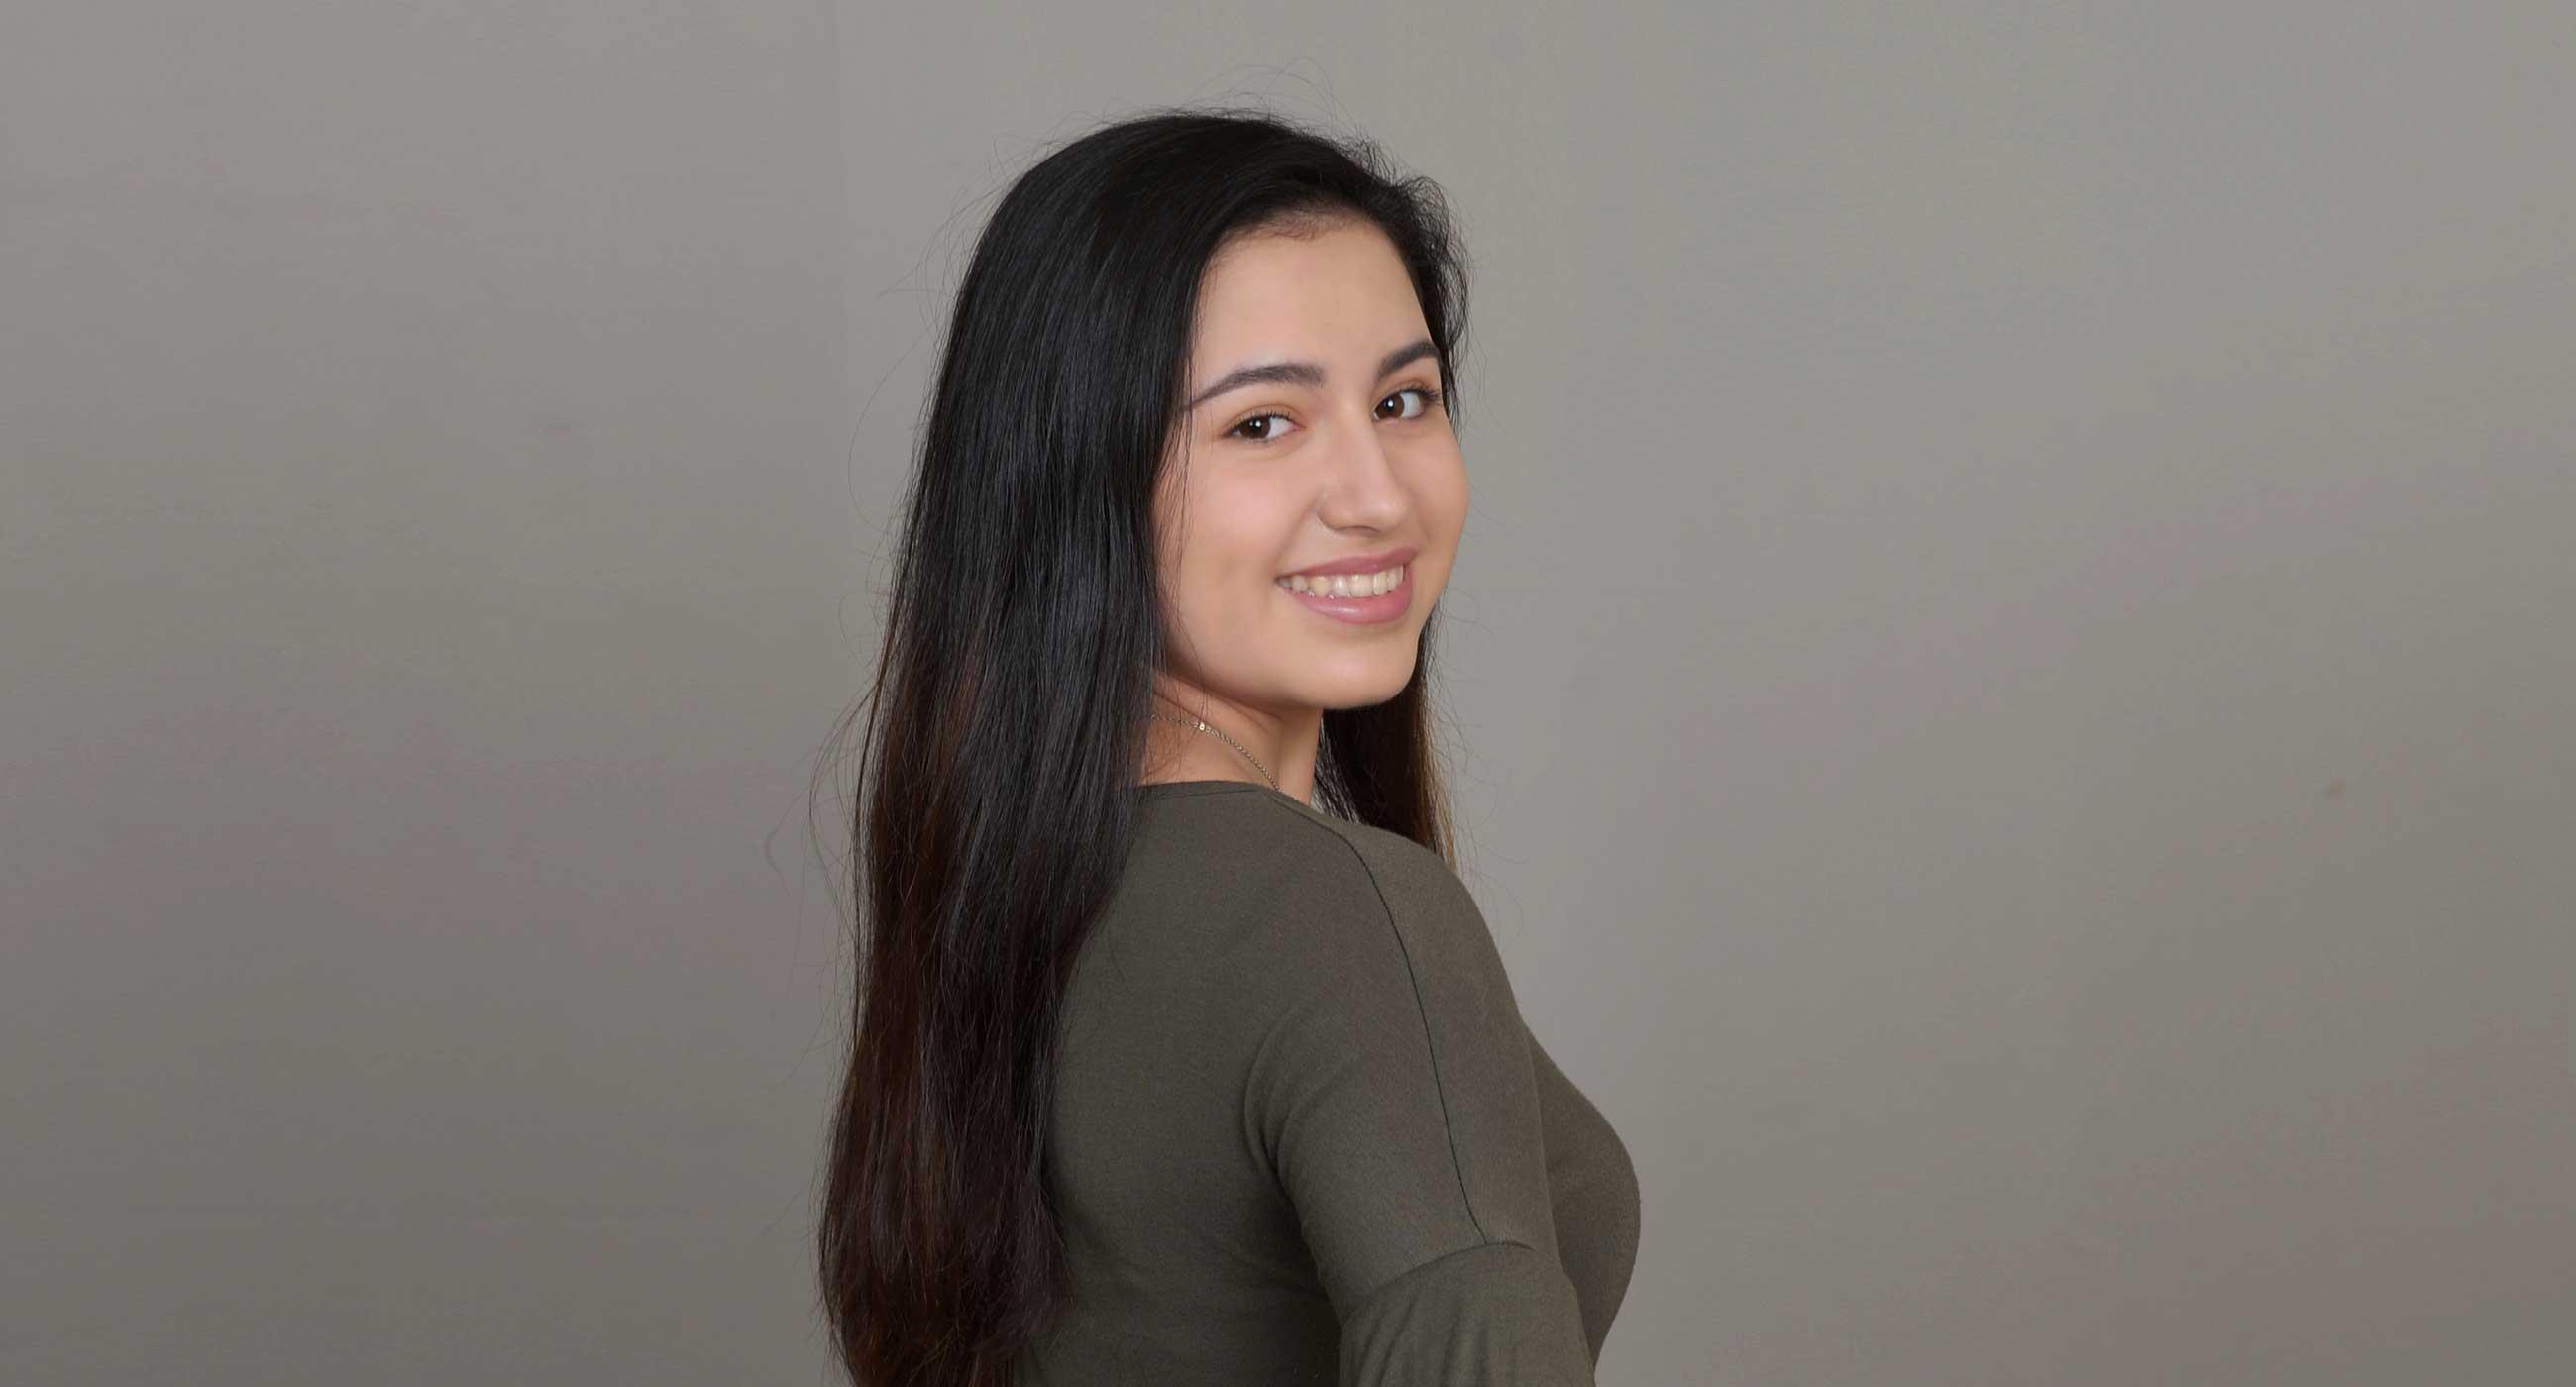 Gianna Pedregon